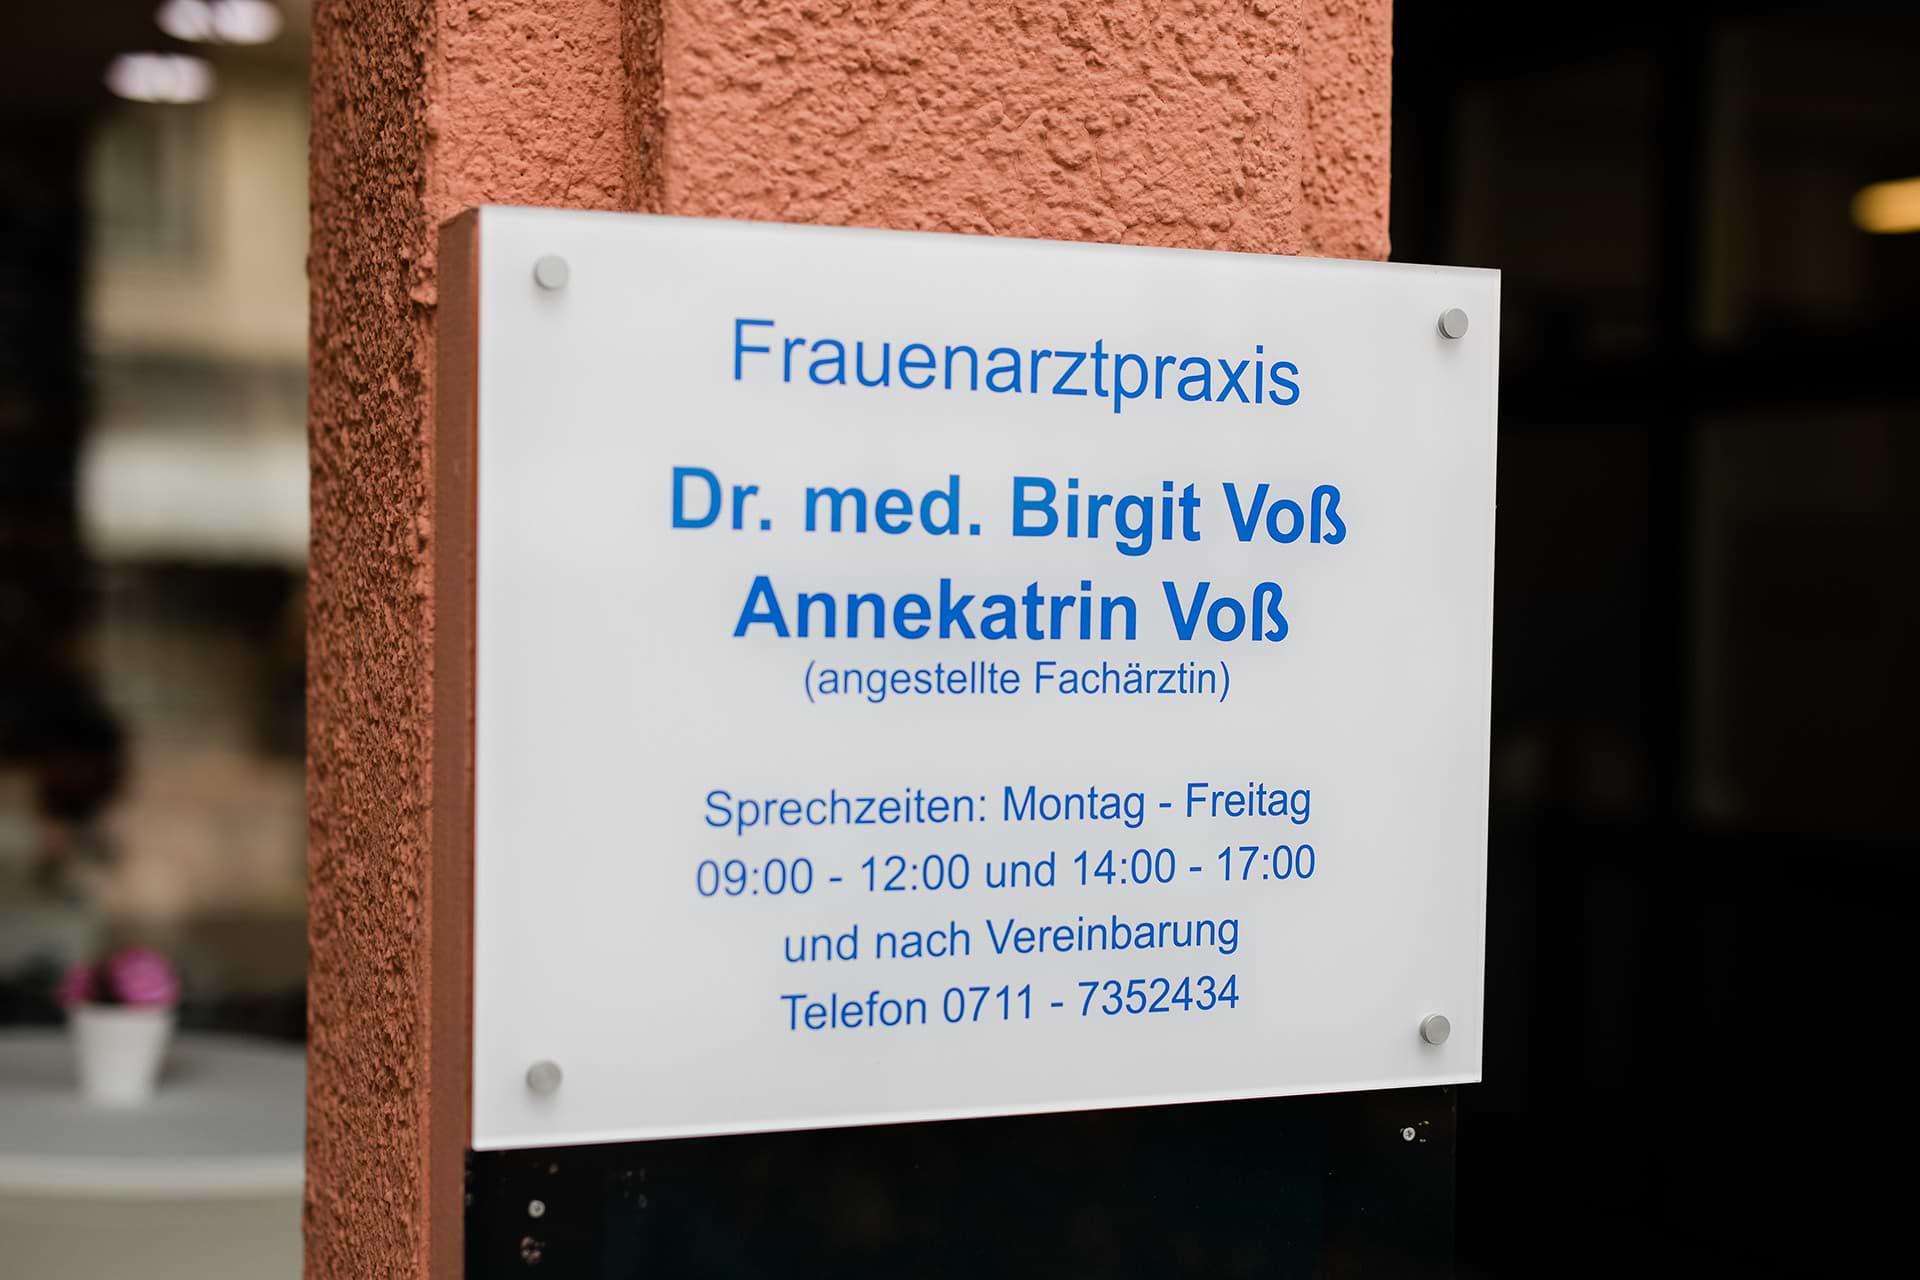 Gynäkologie Stuttgart Vaihingen am Vaihinger Markt